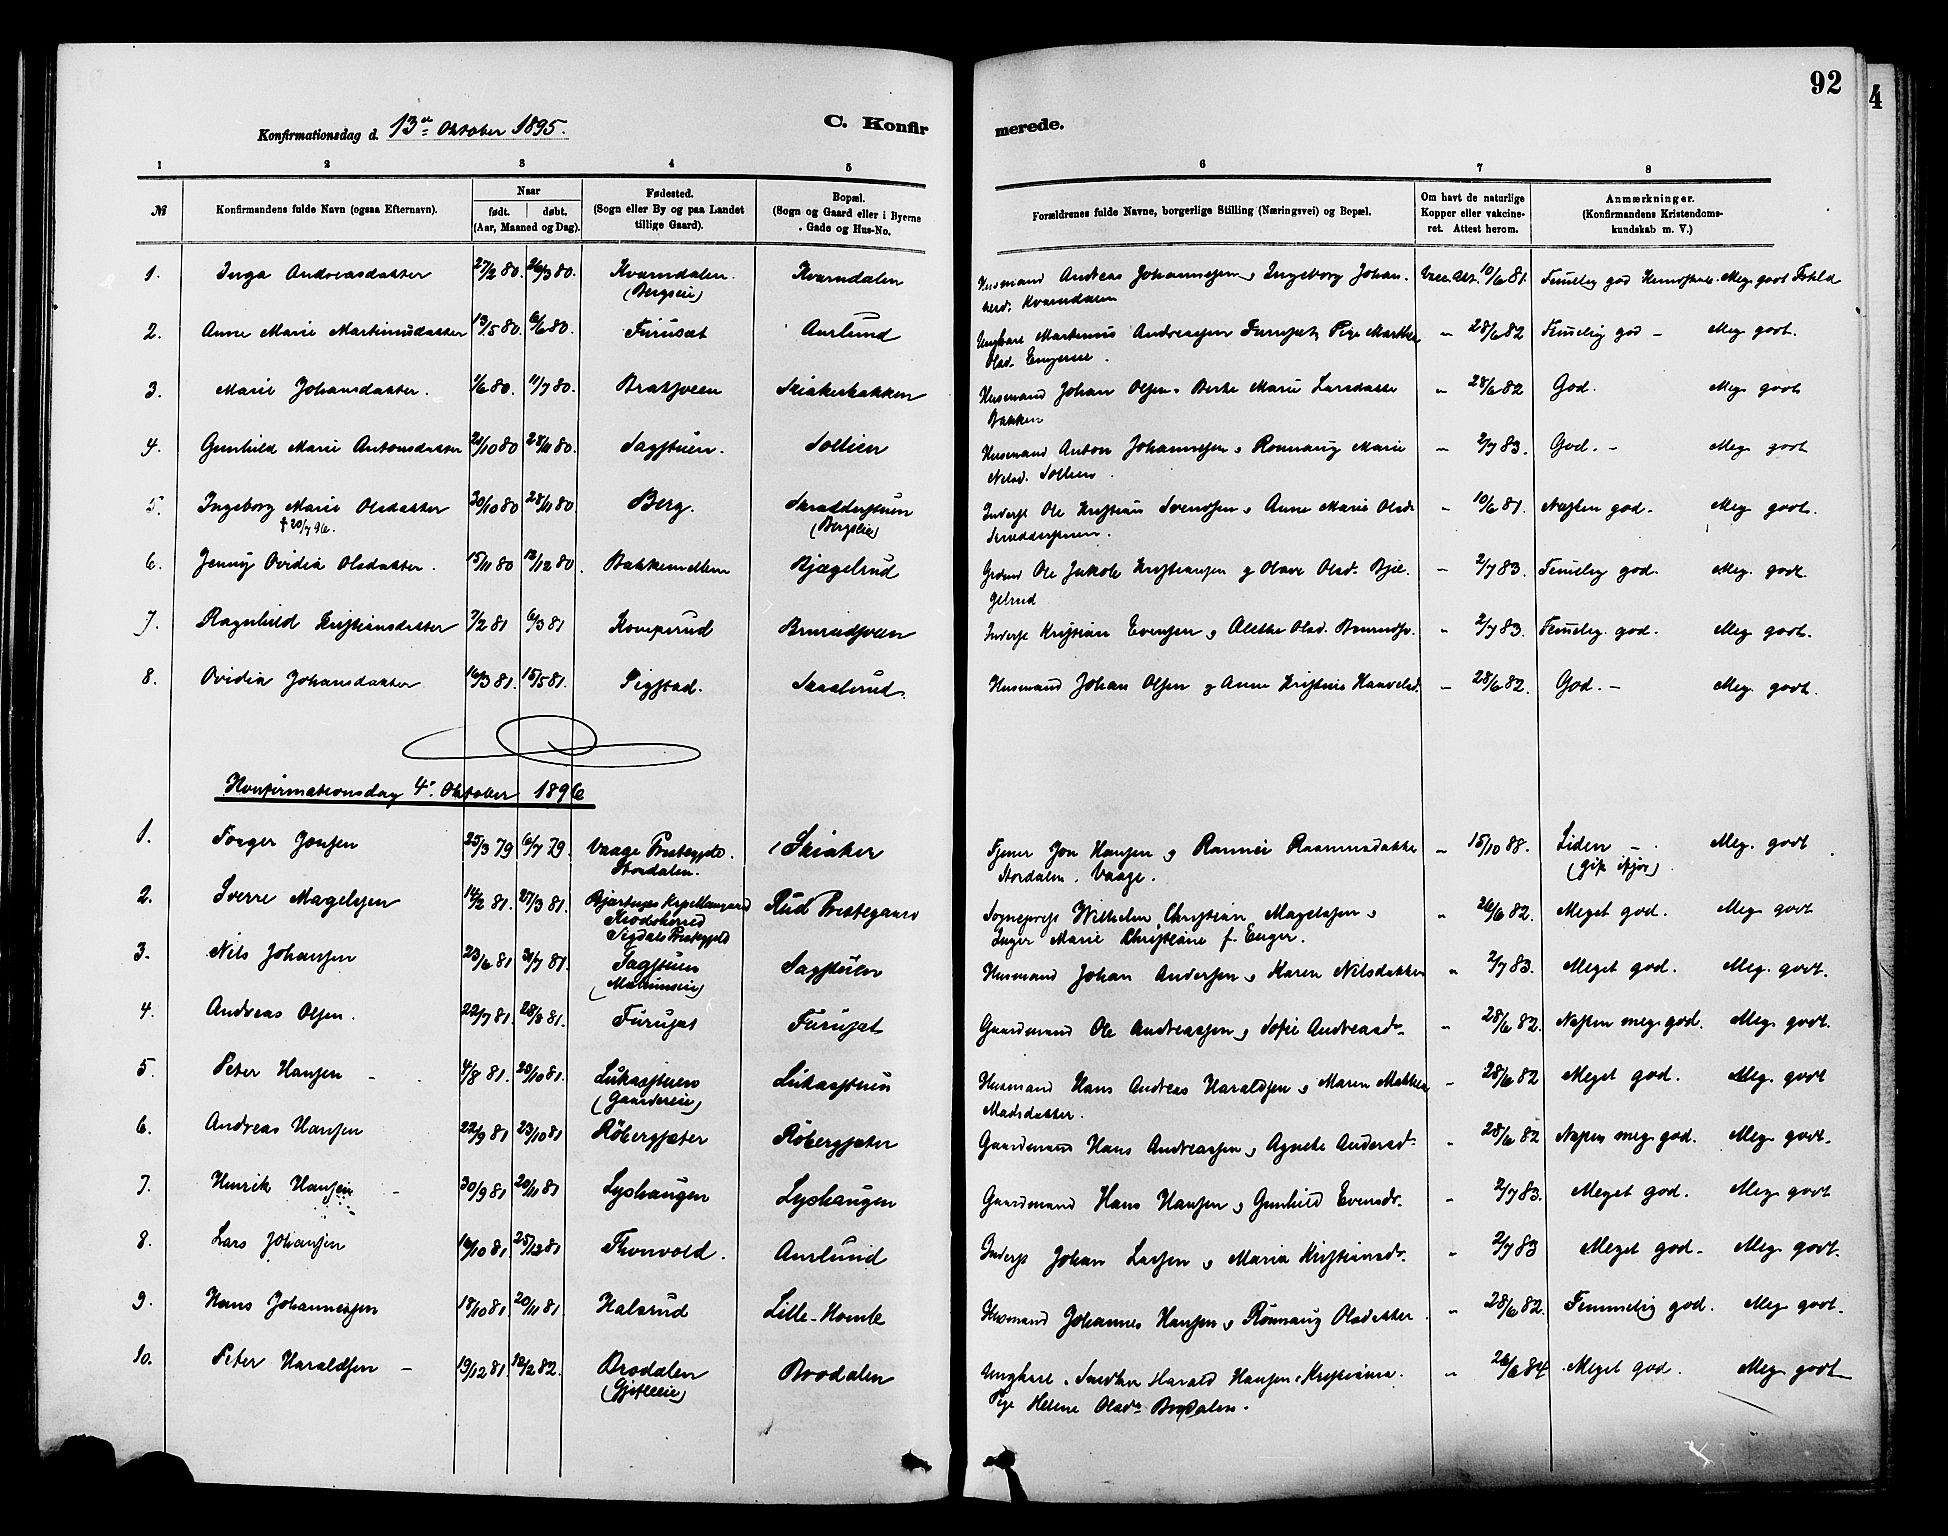 SAH, Nordre Land prestekontor, Ministerialbok nr. 3, 1882-1896, s. 92